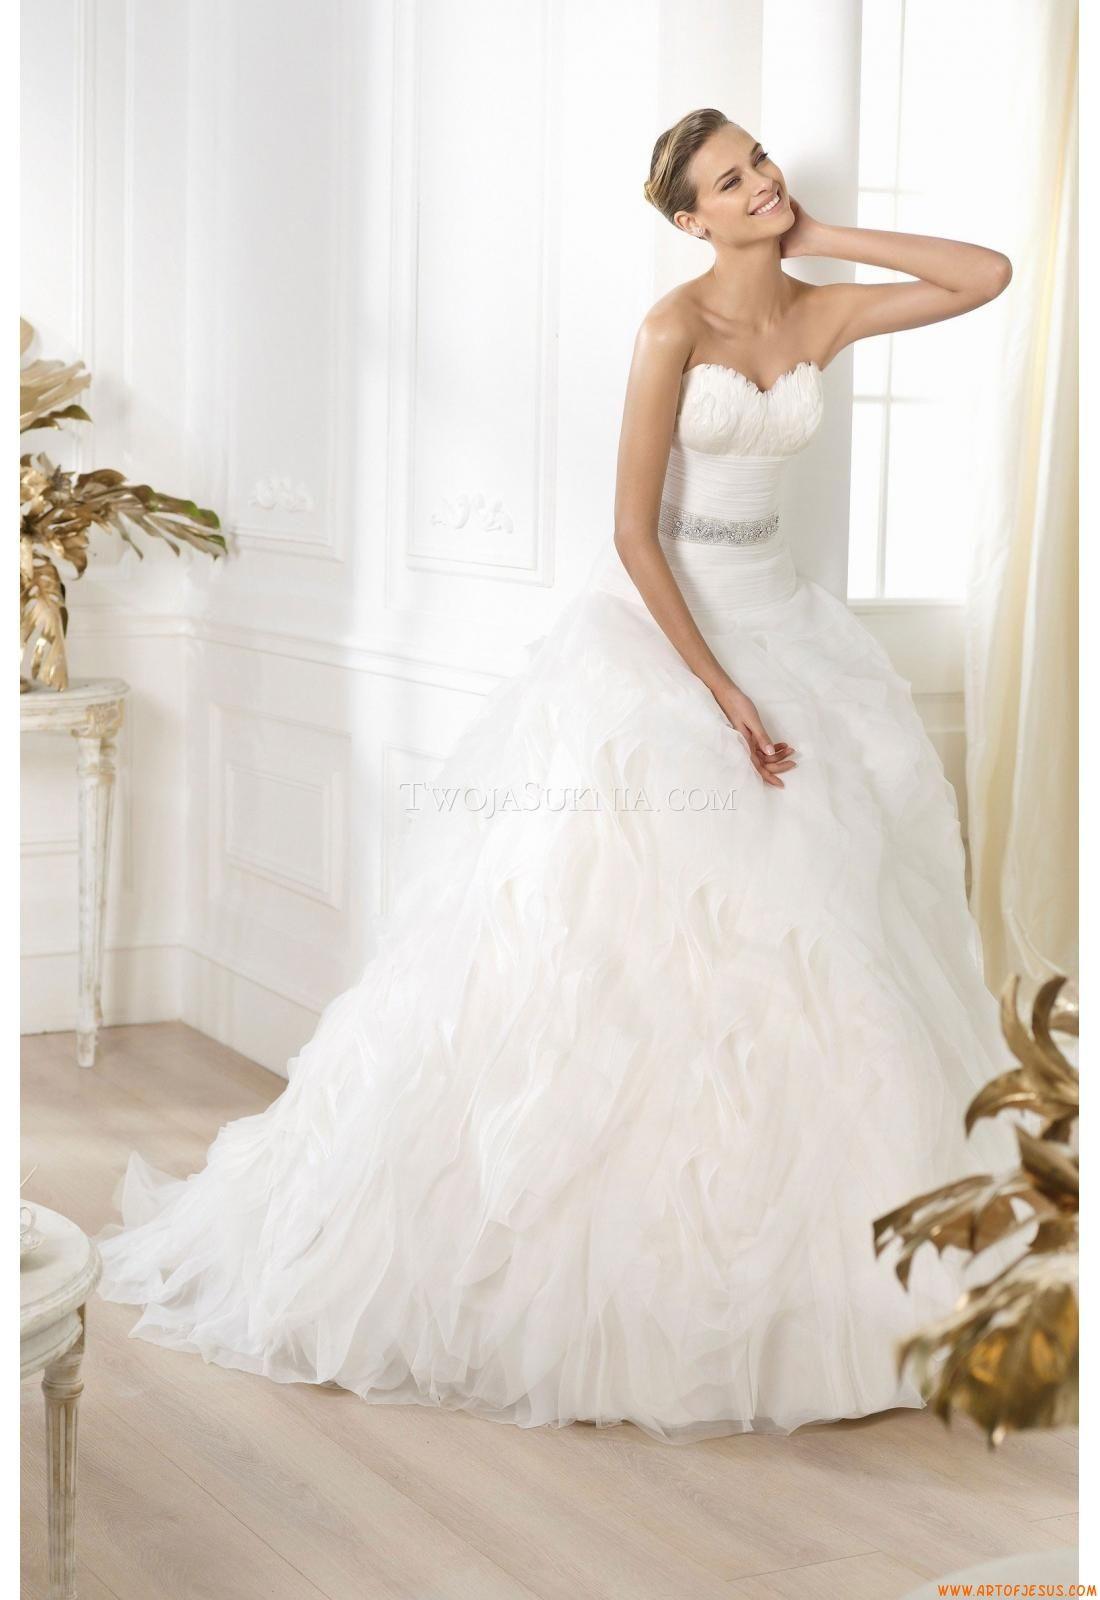 Brautkleider pronovias wien